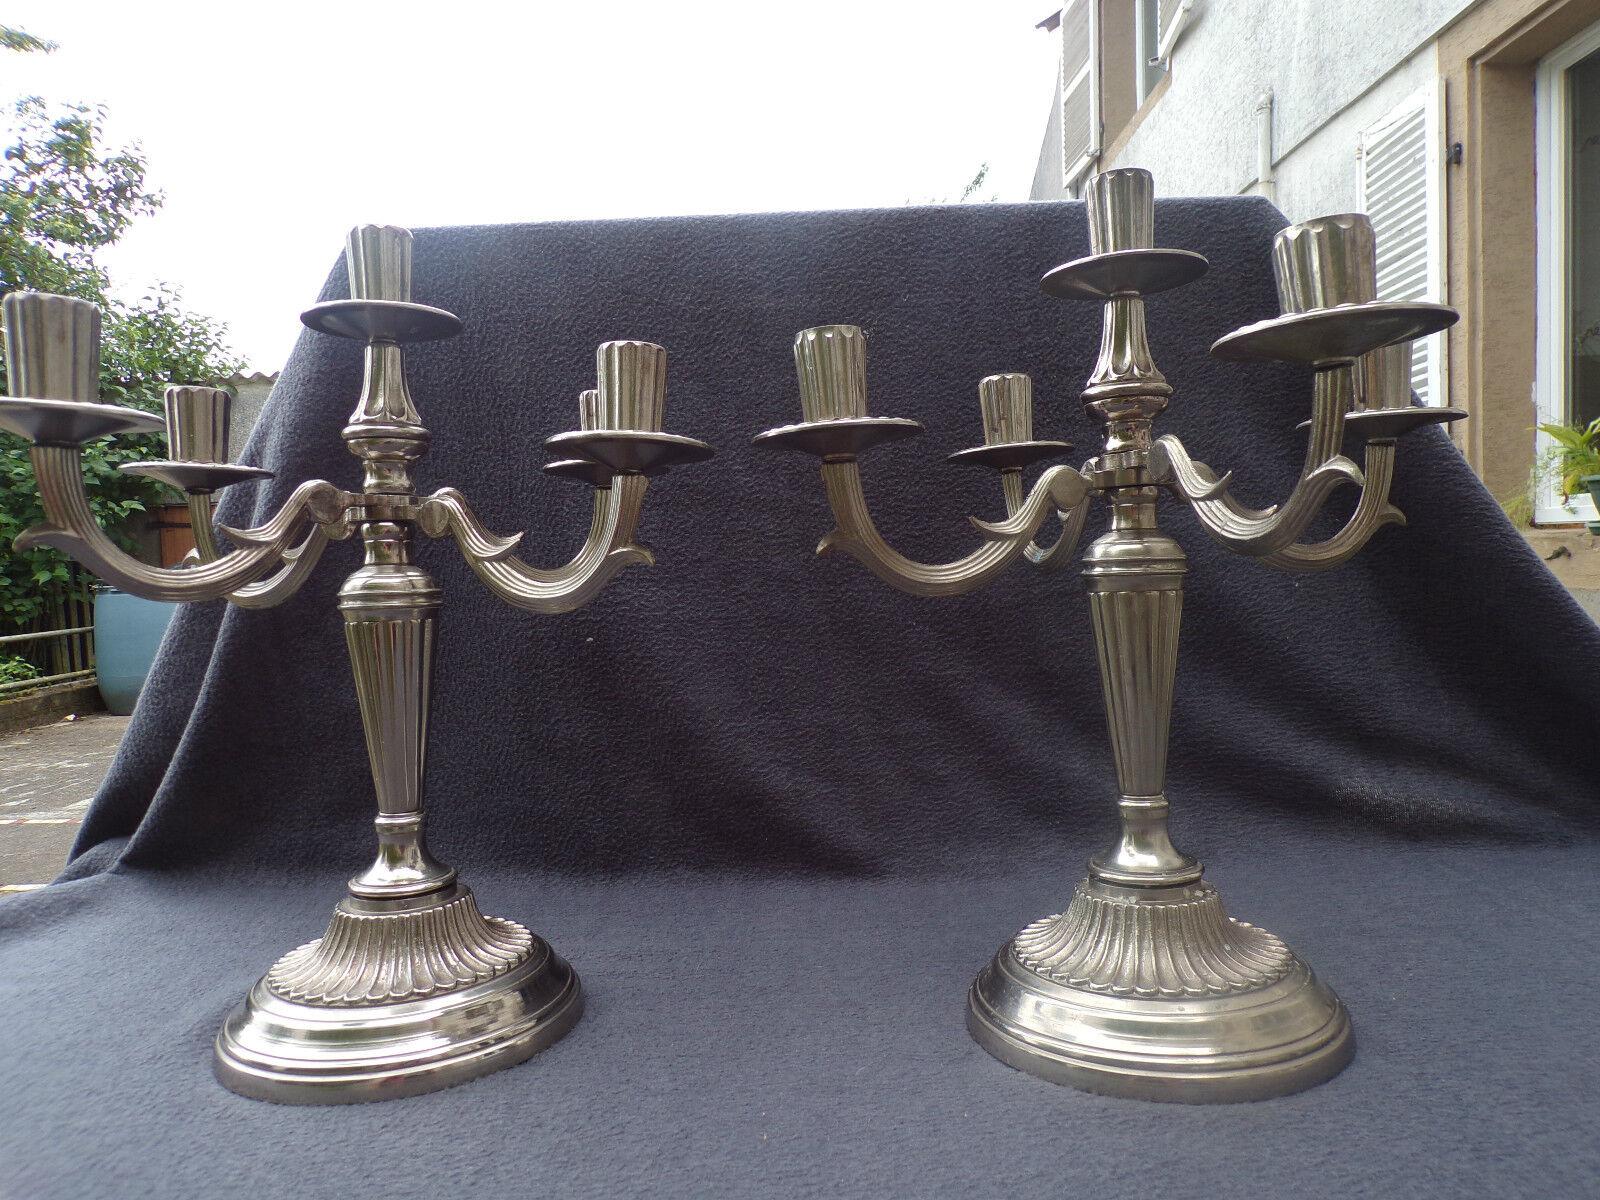 Paar von Kerzenhalter 19eme aus Bronze Versilbert 4 Querlenker Licht